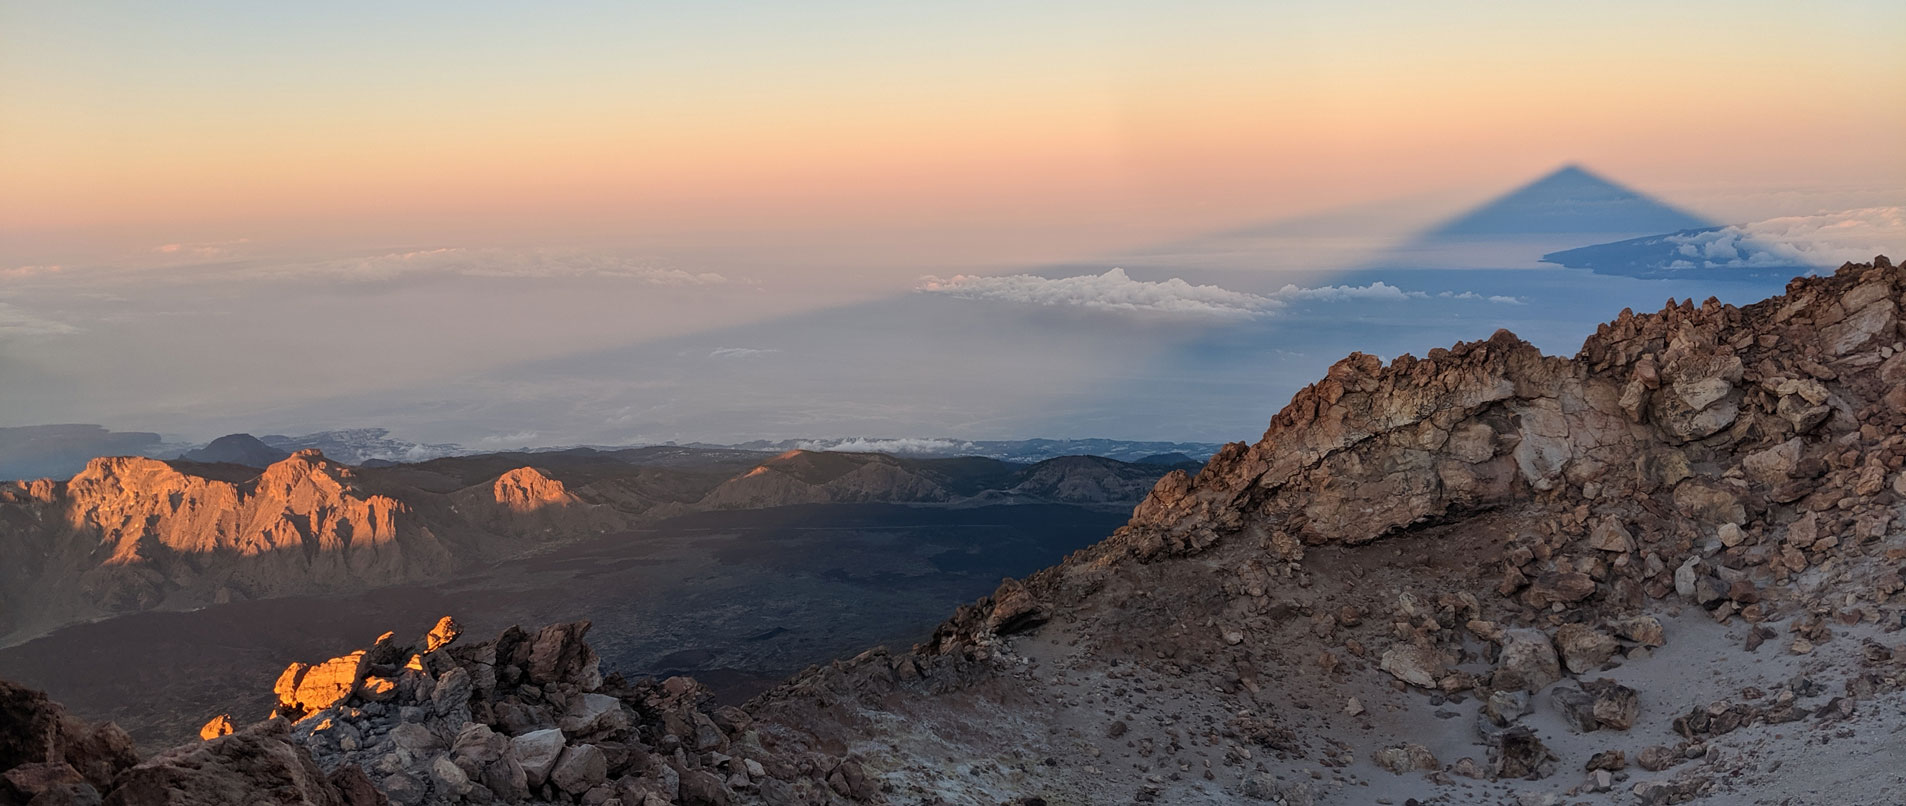 Tenerife-project